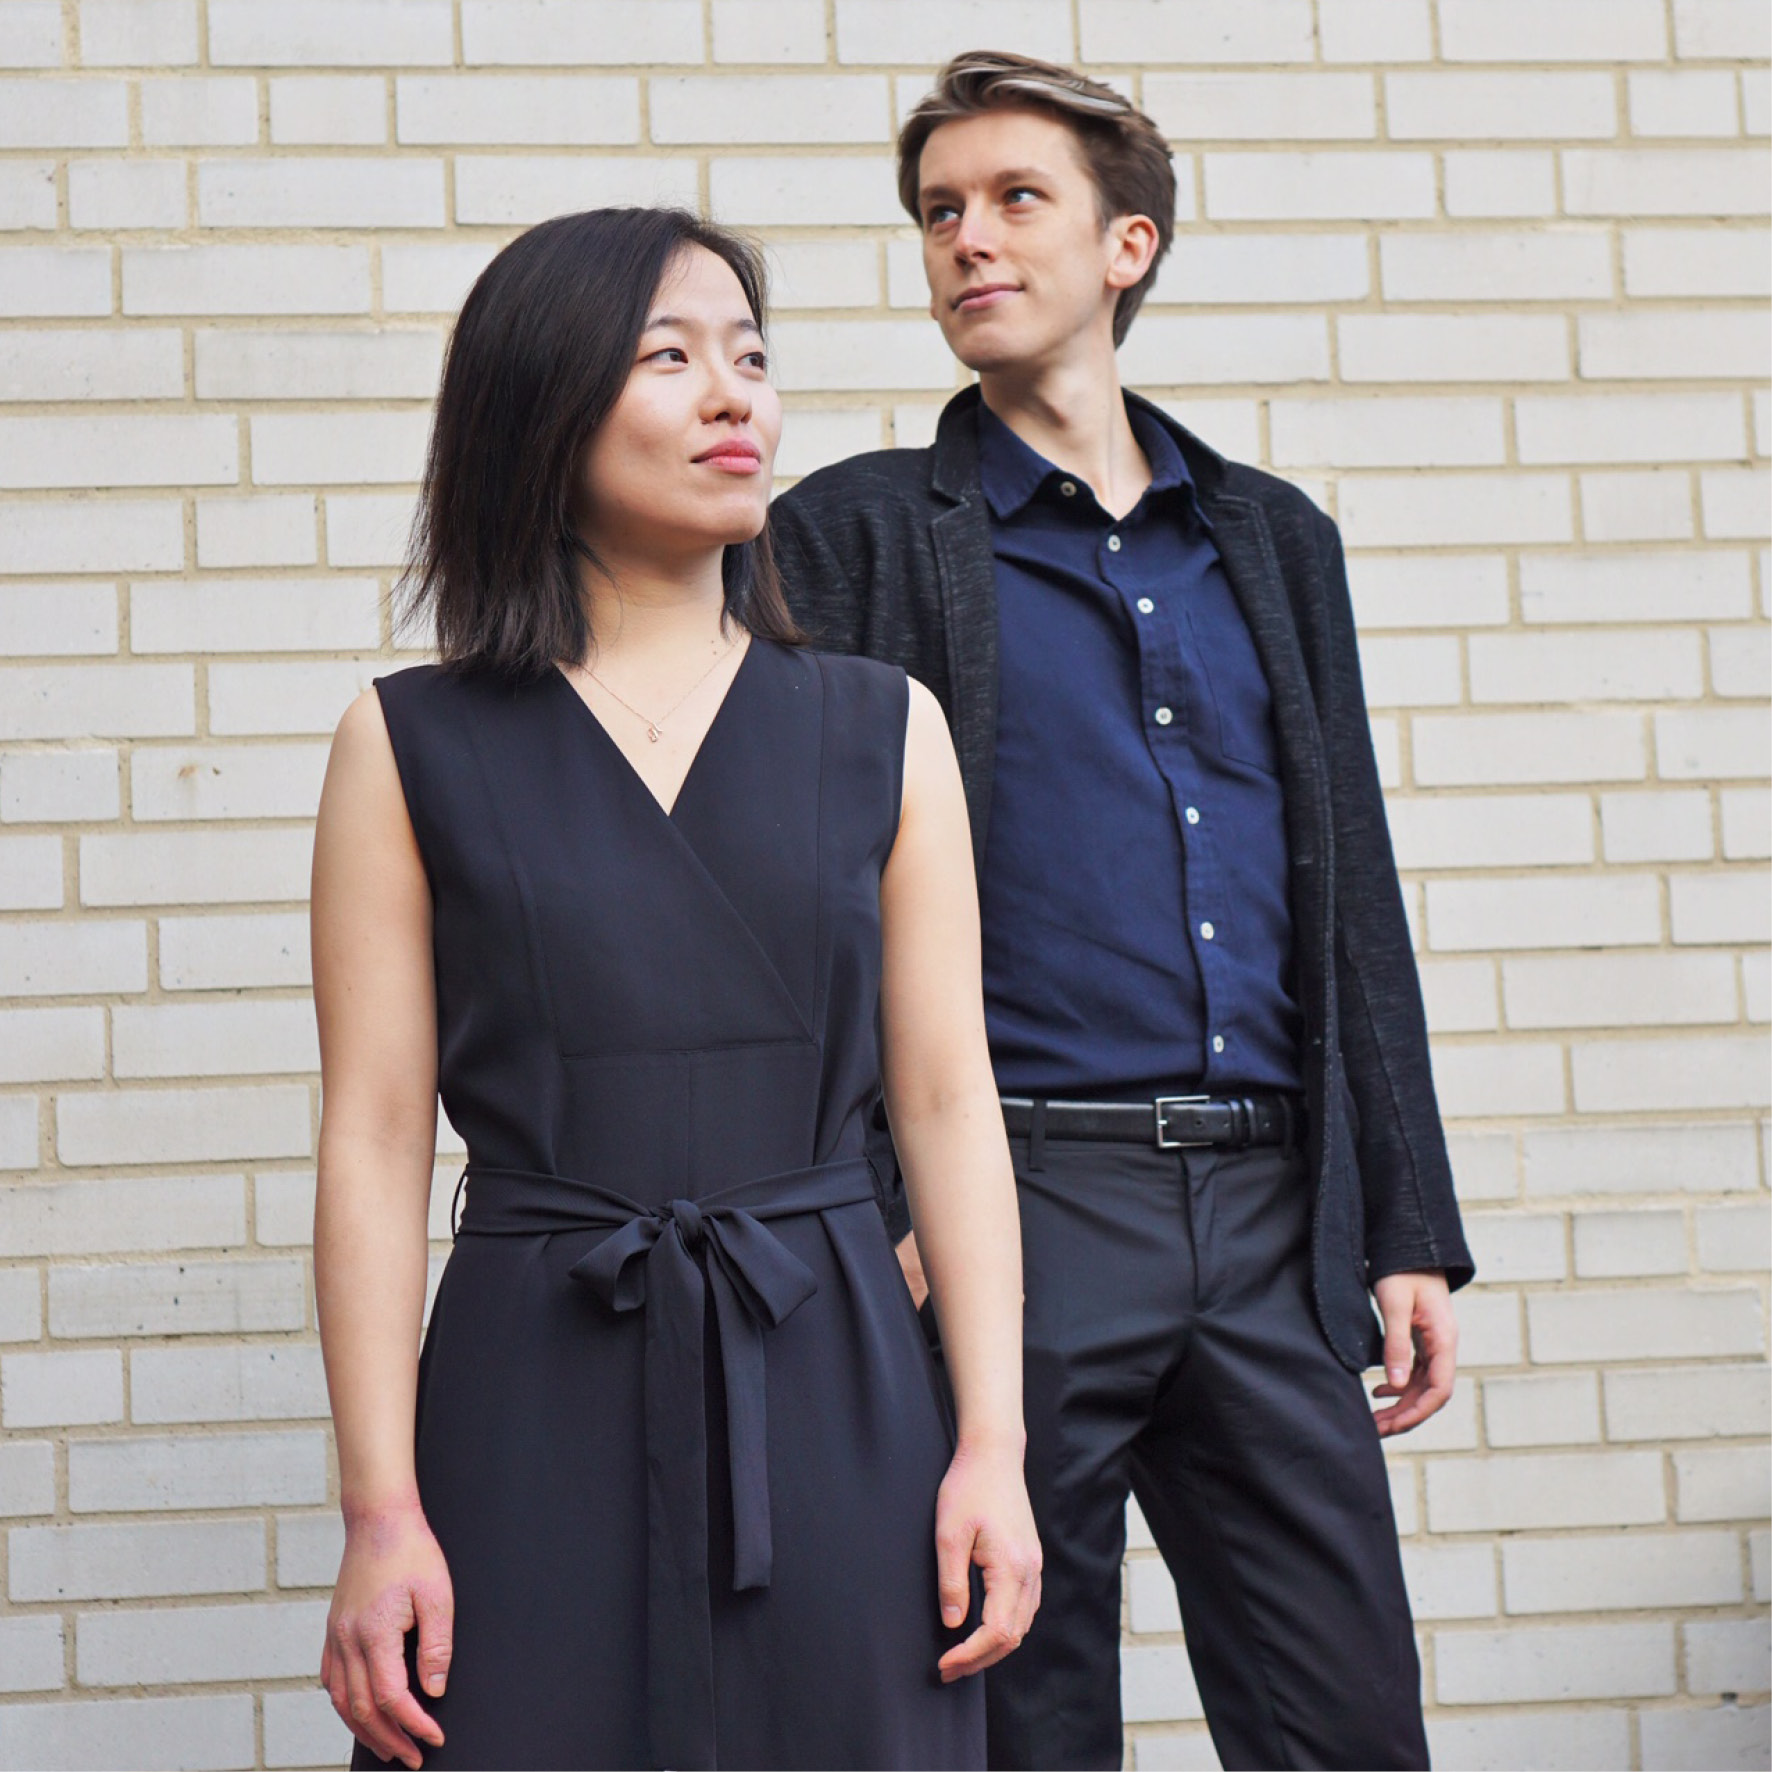 Duo 11: Arvid Fagerfjäll / Hikaru Kanki